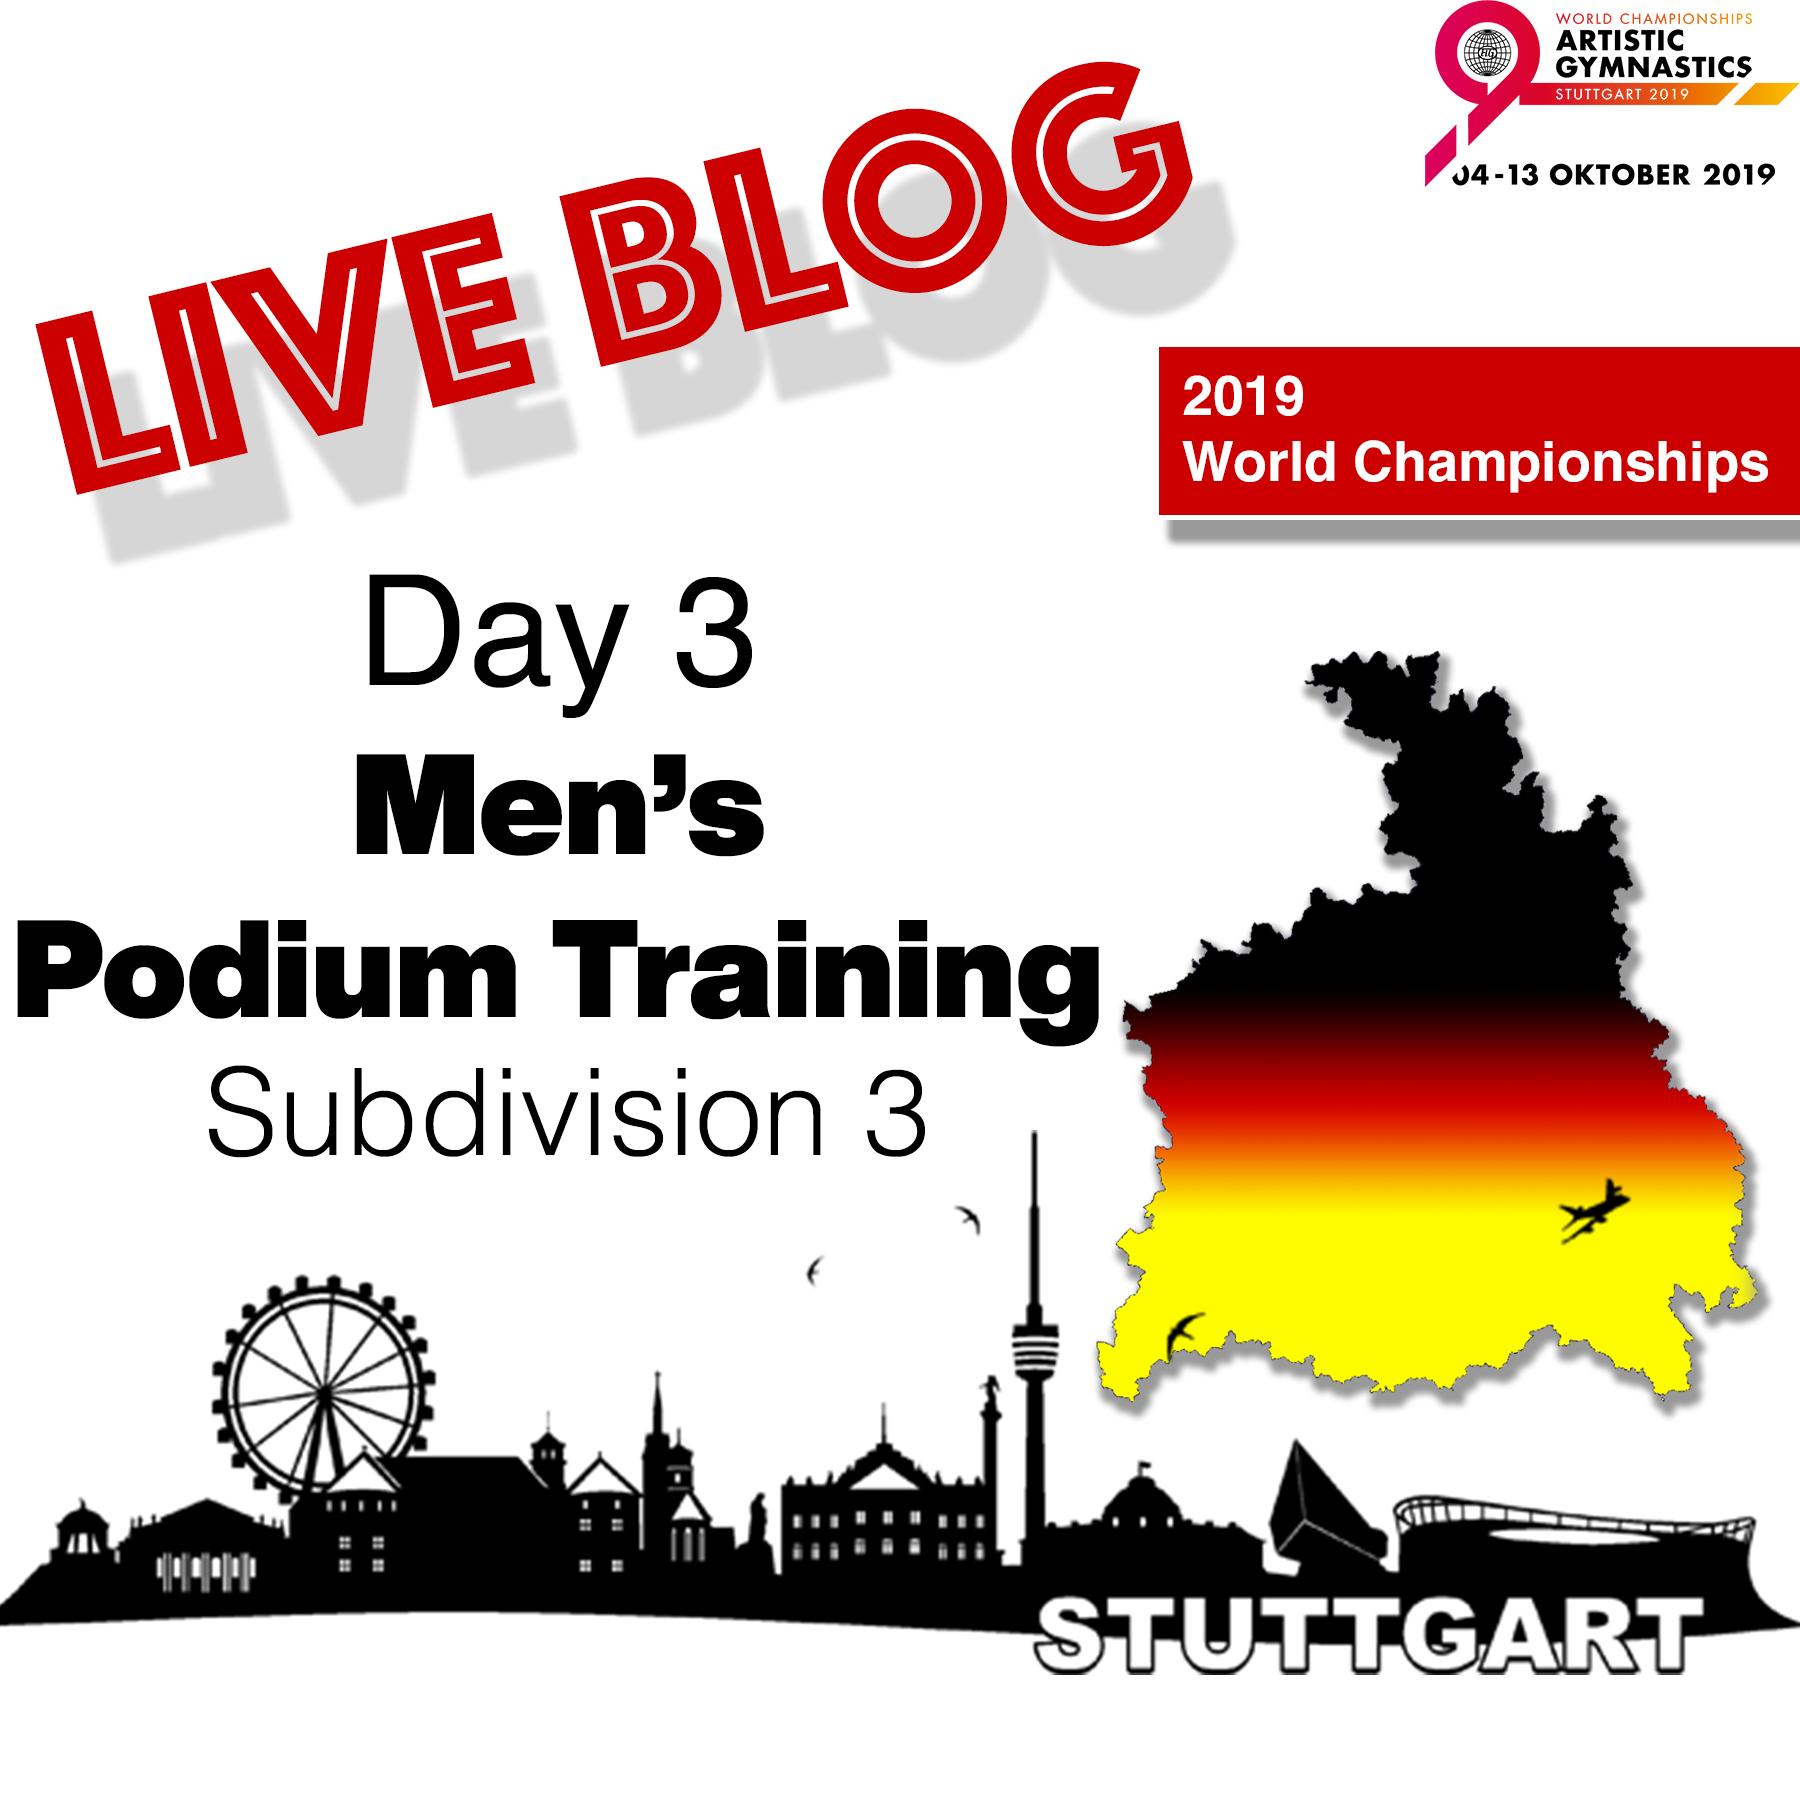 Live Blog: 2019 World Championships – MAG Podium Training – Sub Division 3, Oct. 2nd